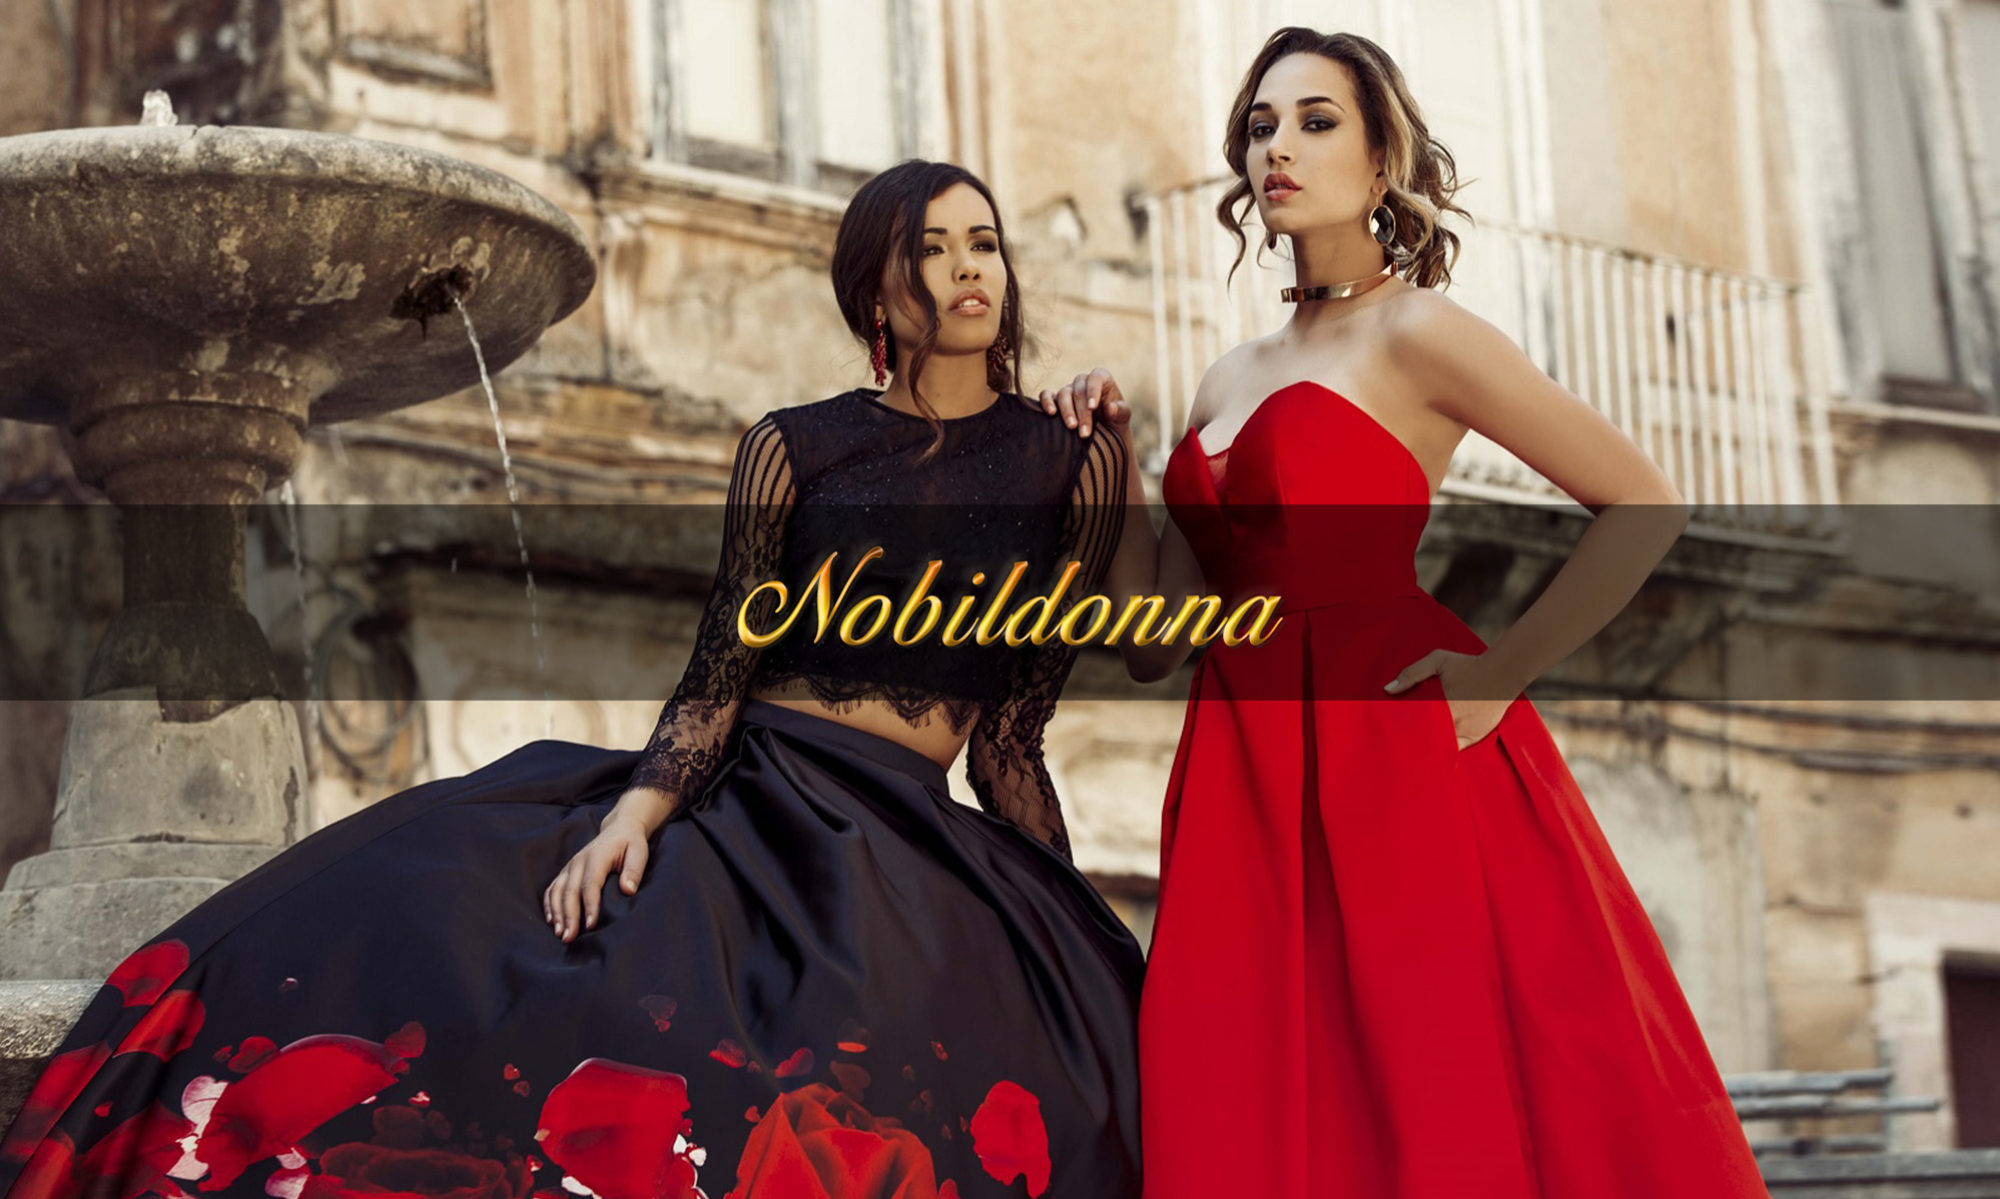 Nobildonna